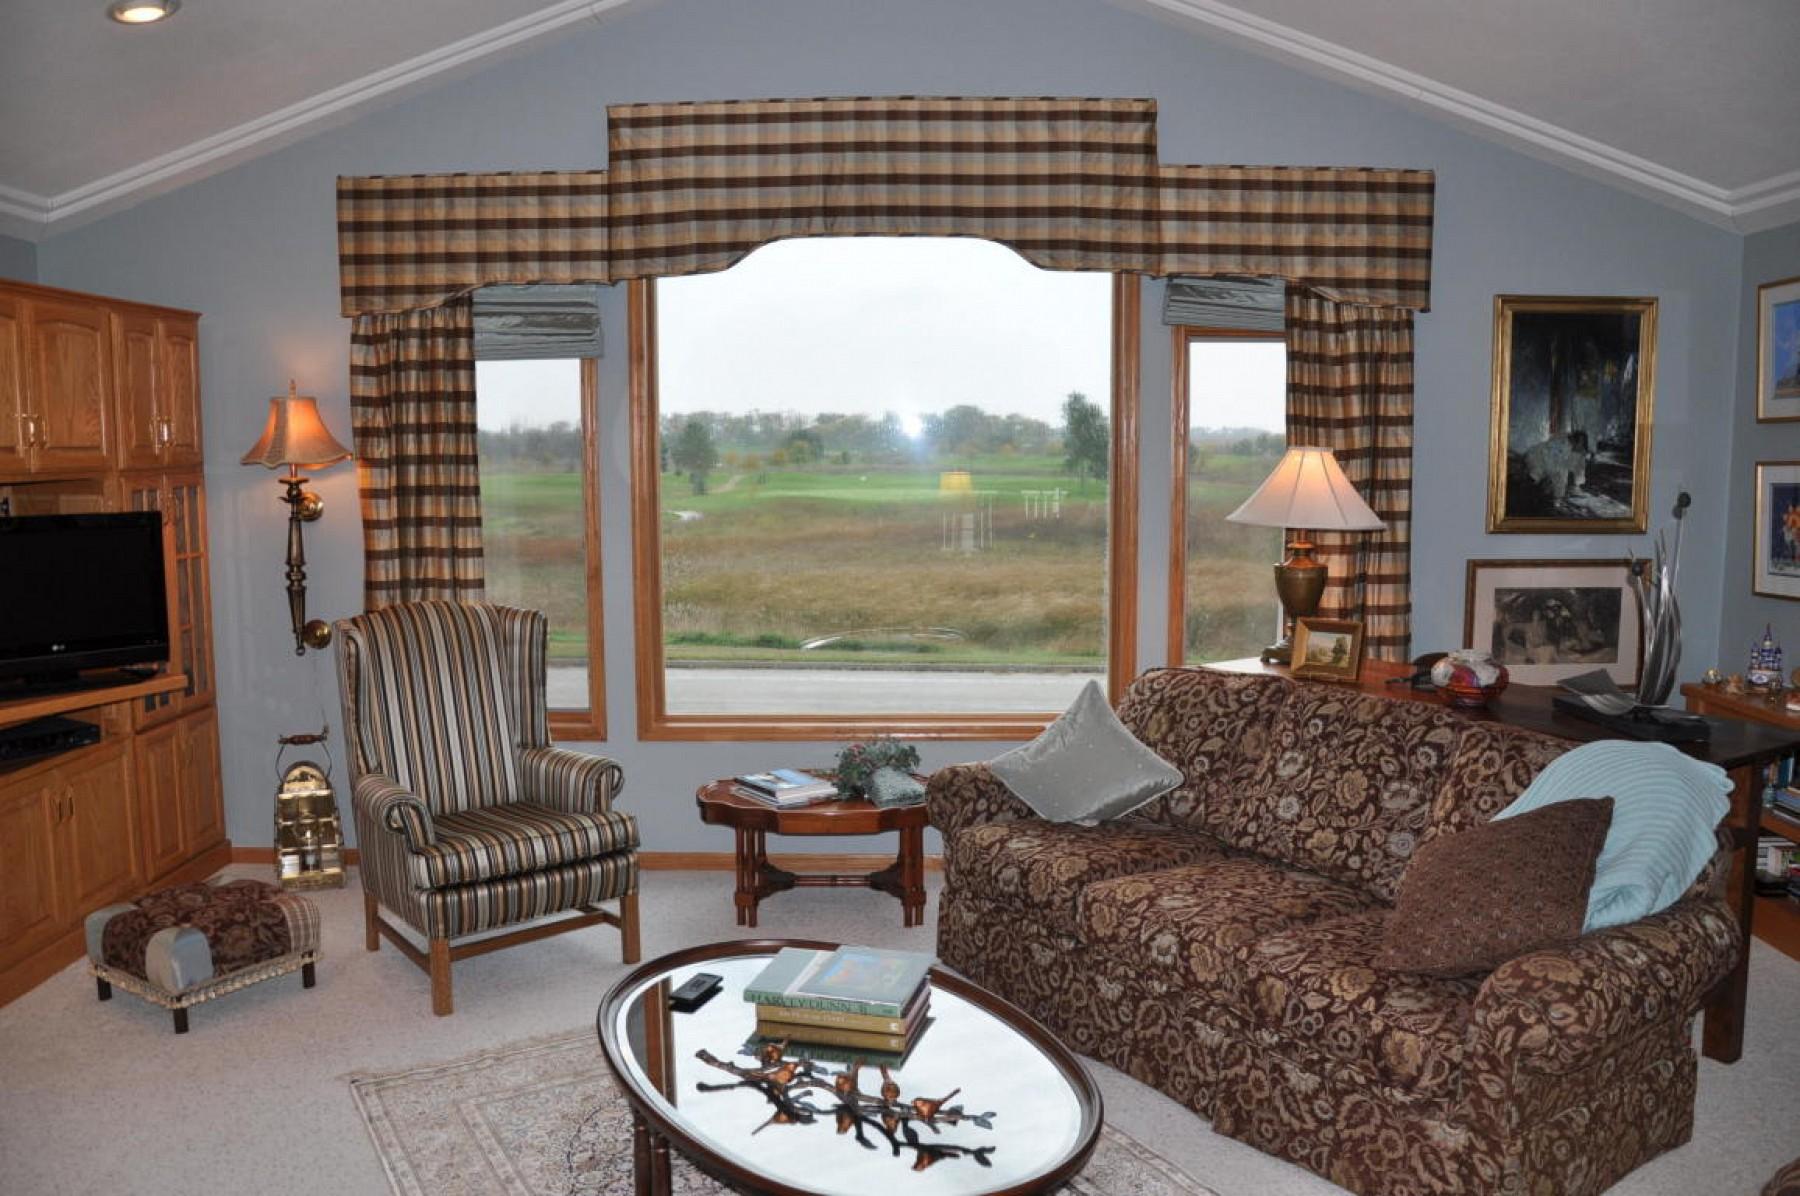 506 Meadow CreekDrive, Volga, SD 57071